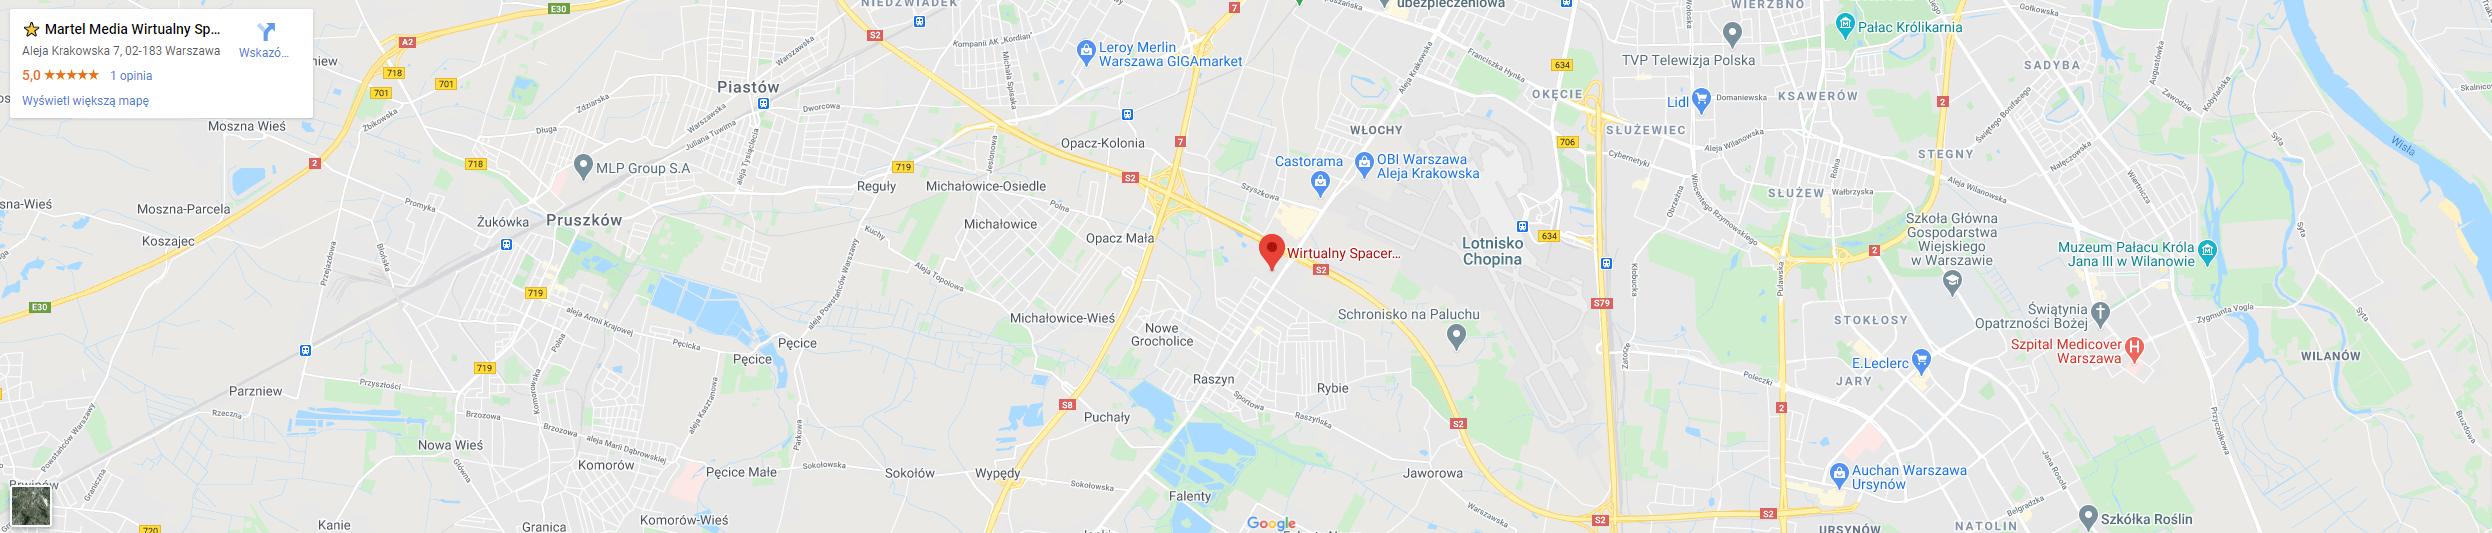 mapa martel m